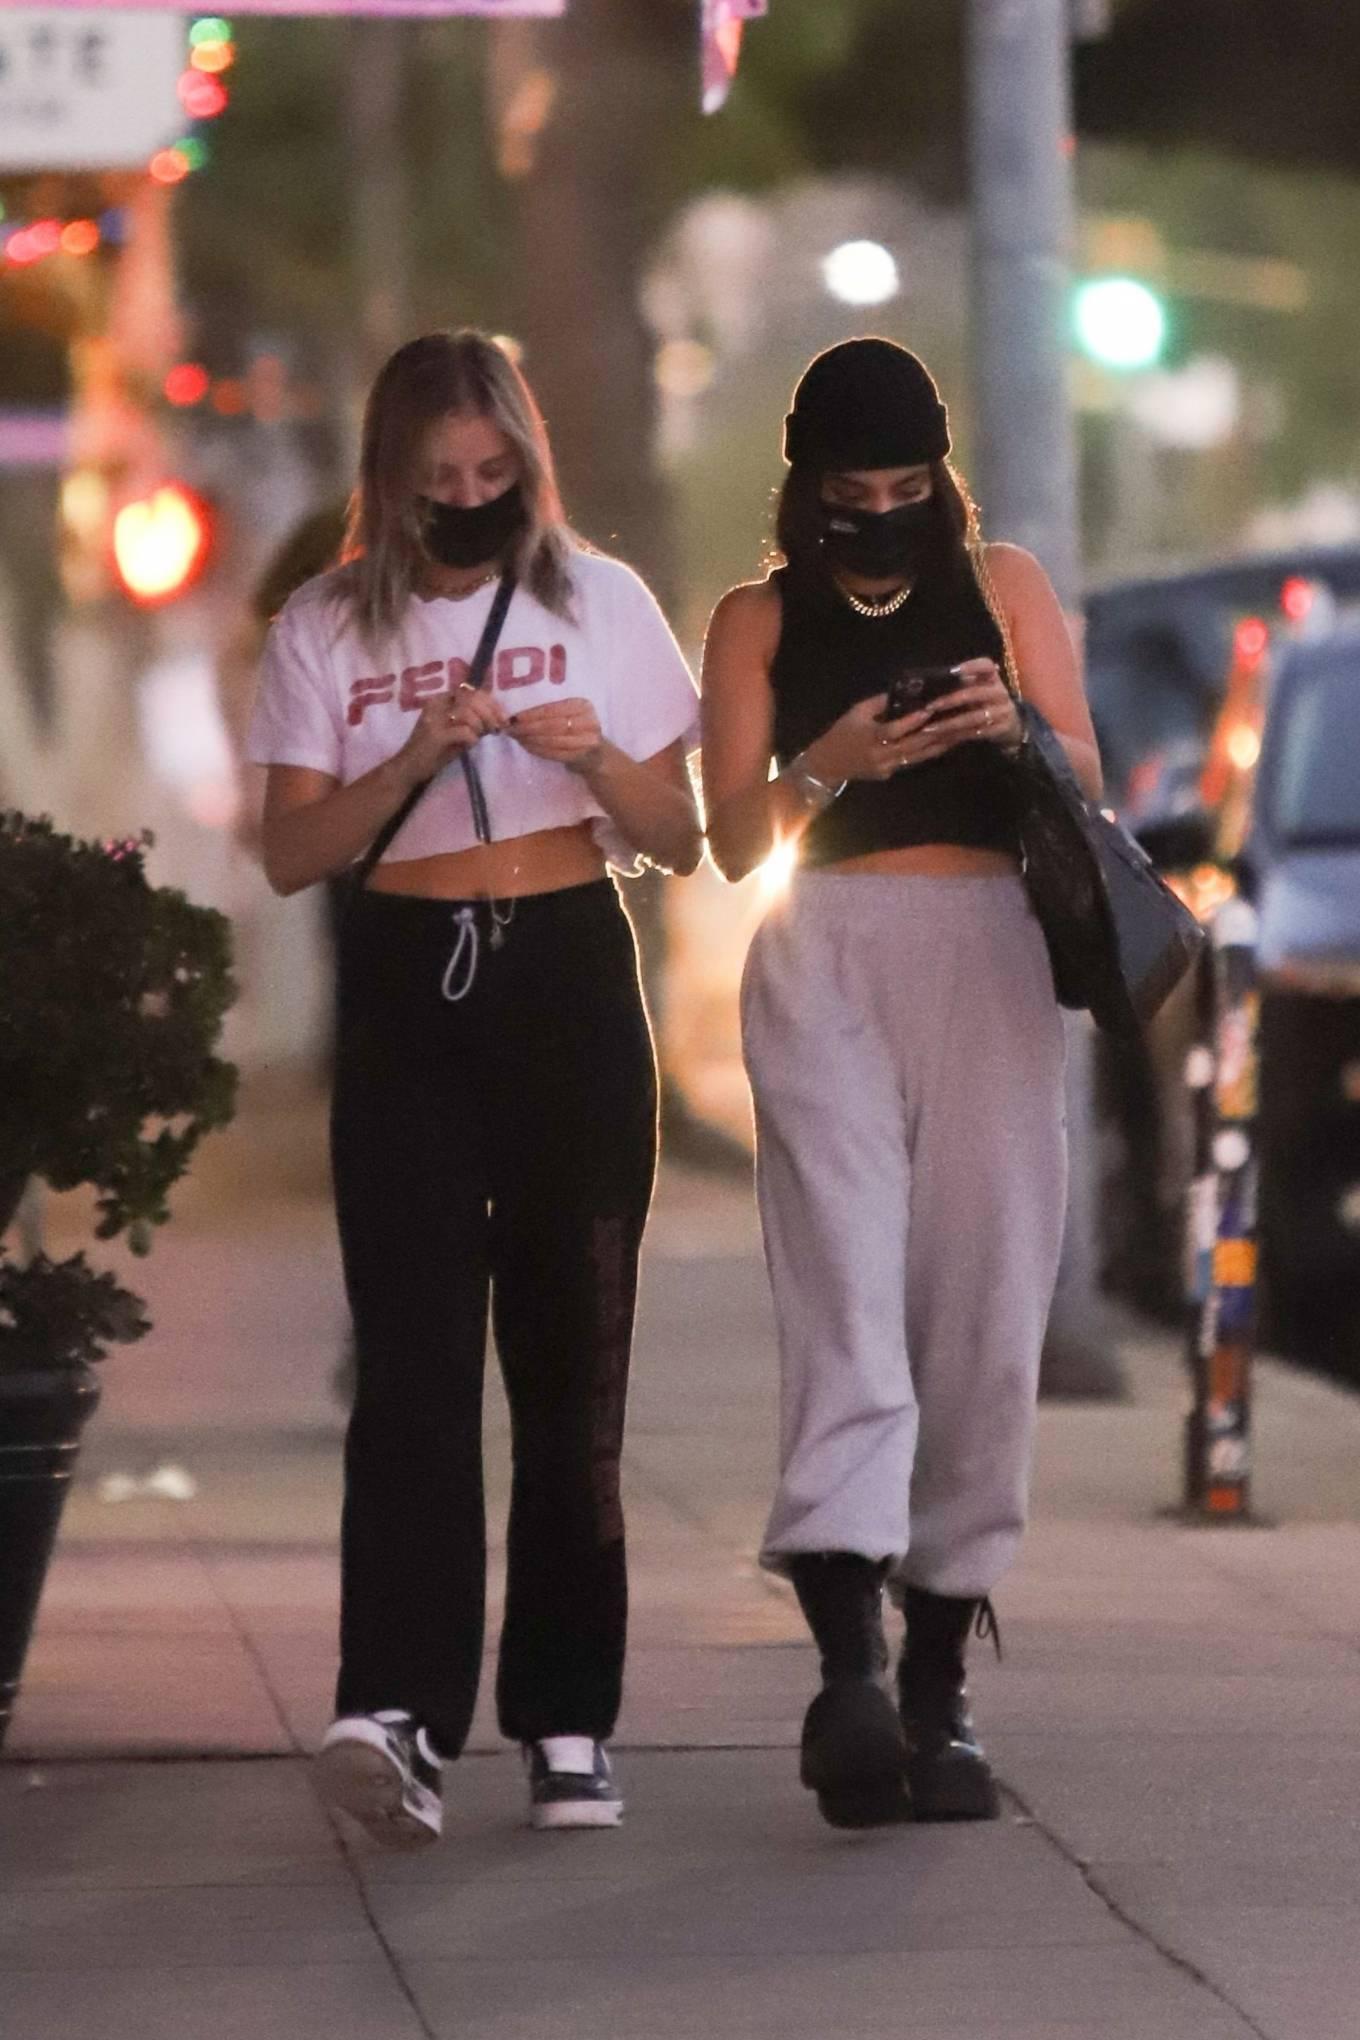 Vanessa Hudgens and GG Magree - Seen out in Los Feliz